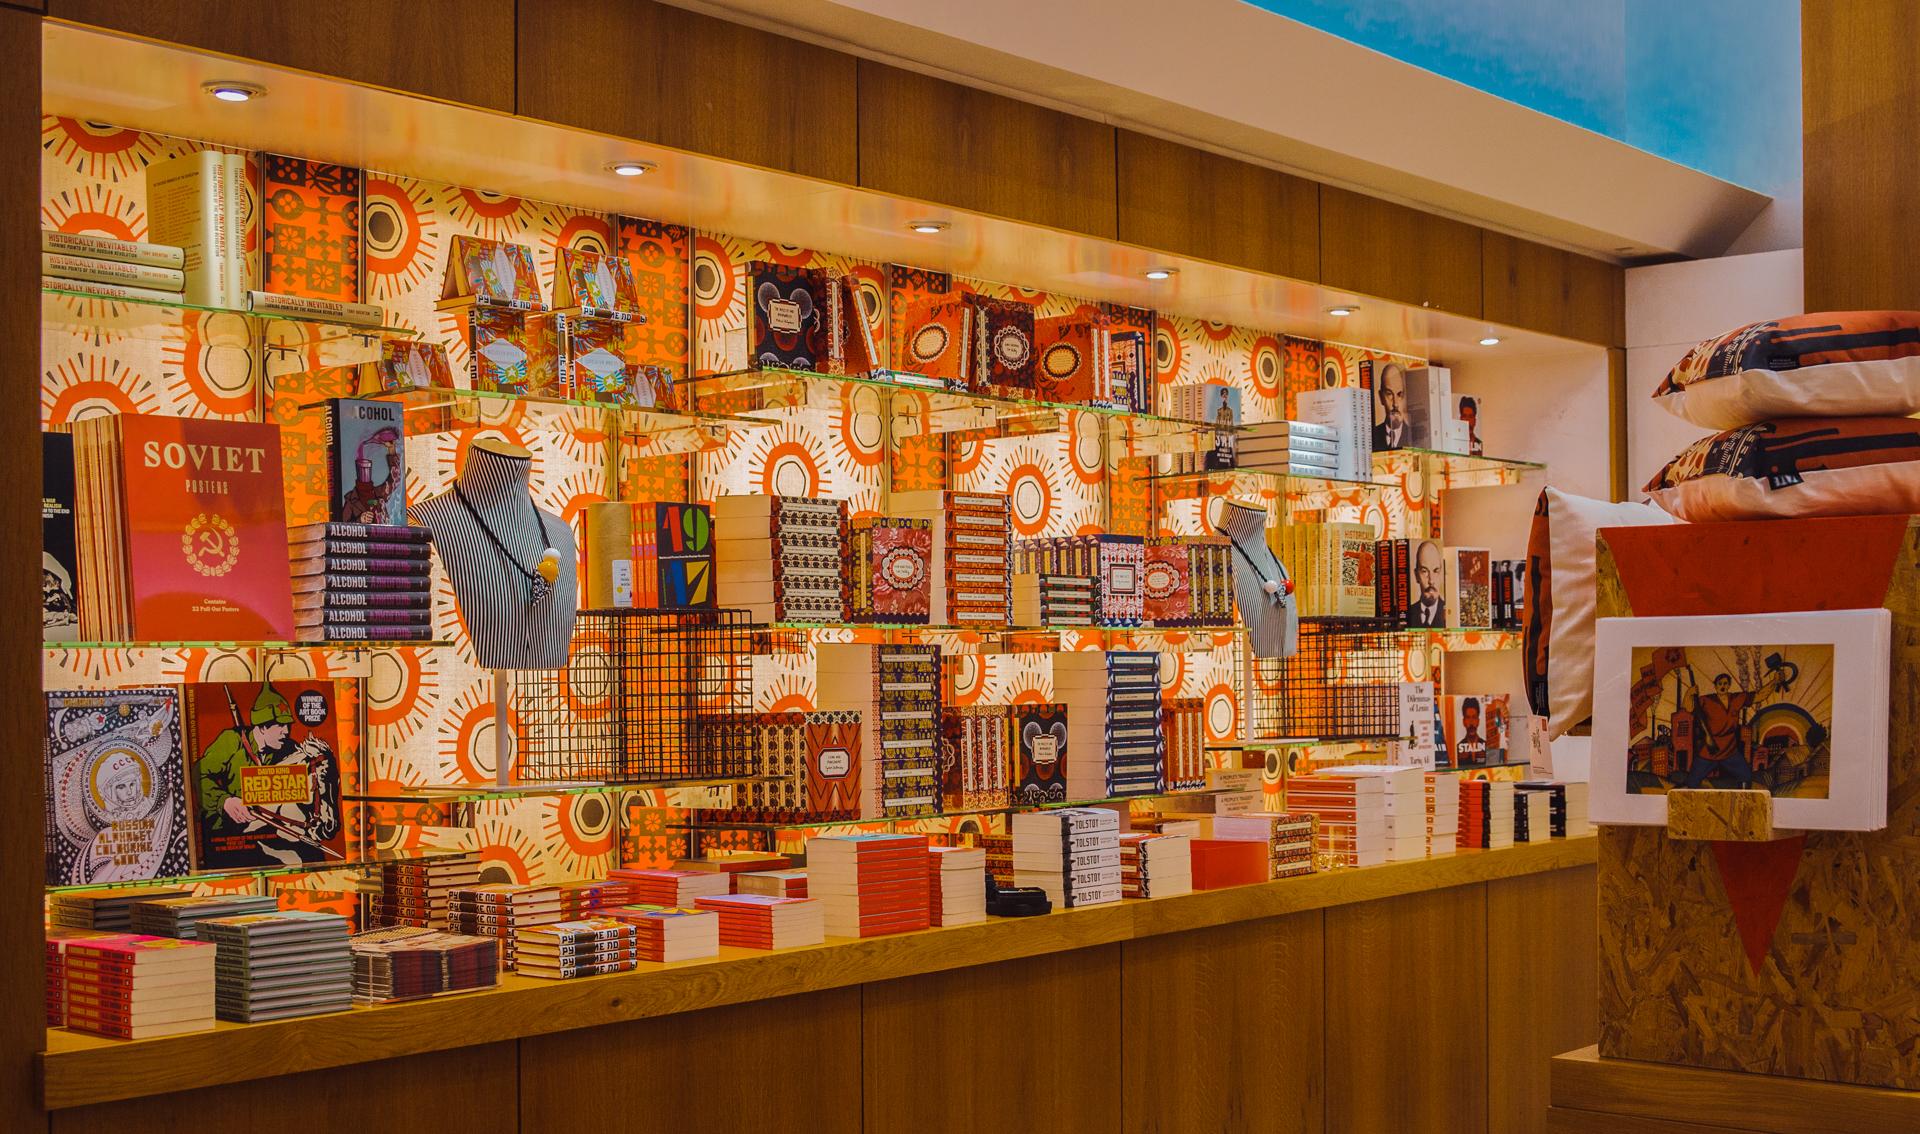 British Library - Russian Revolution Exhibition Shop